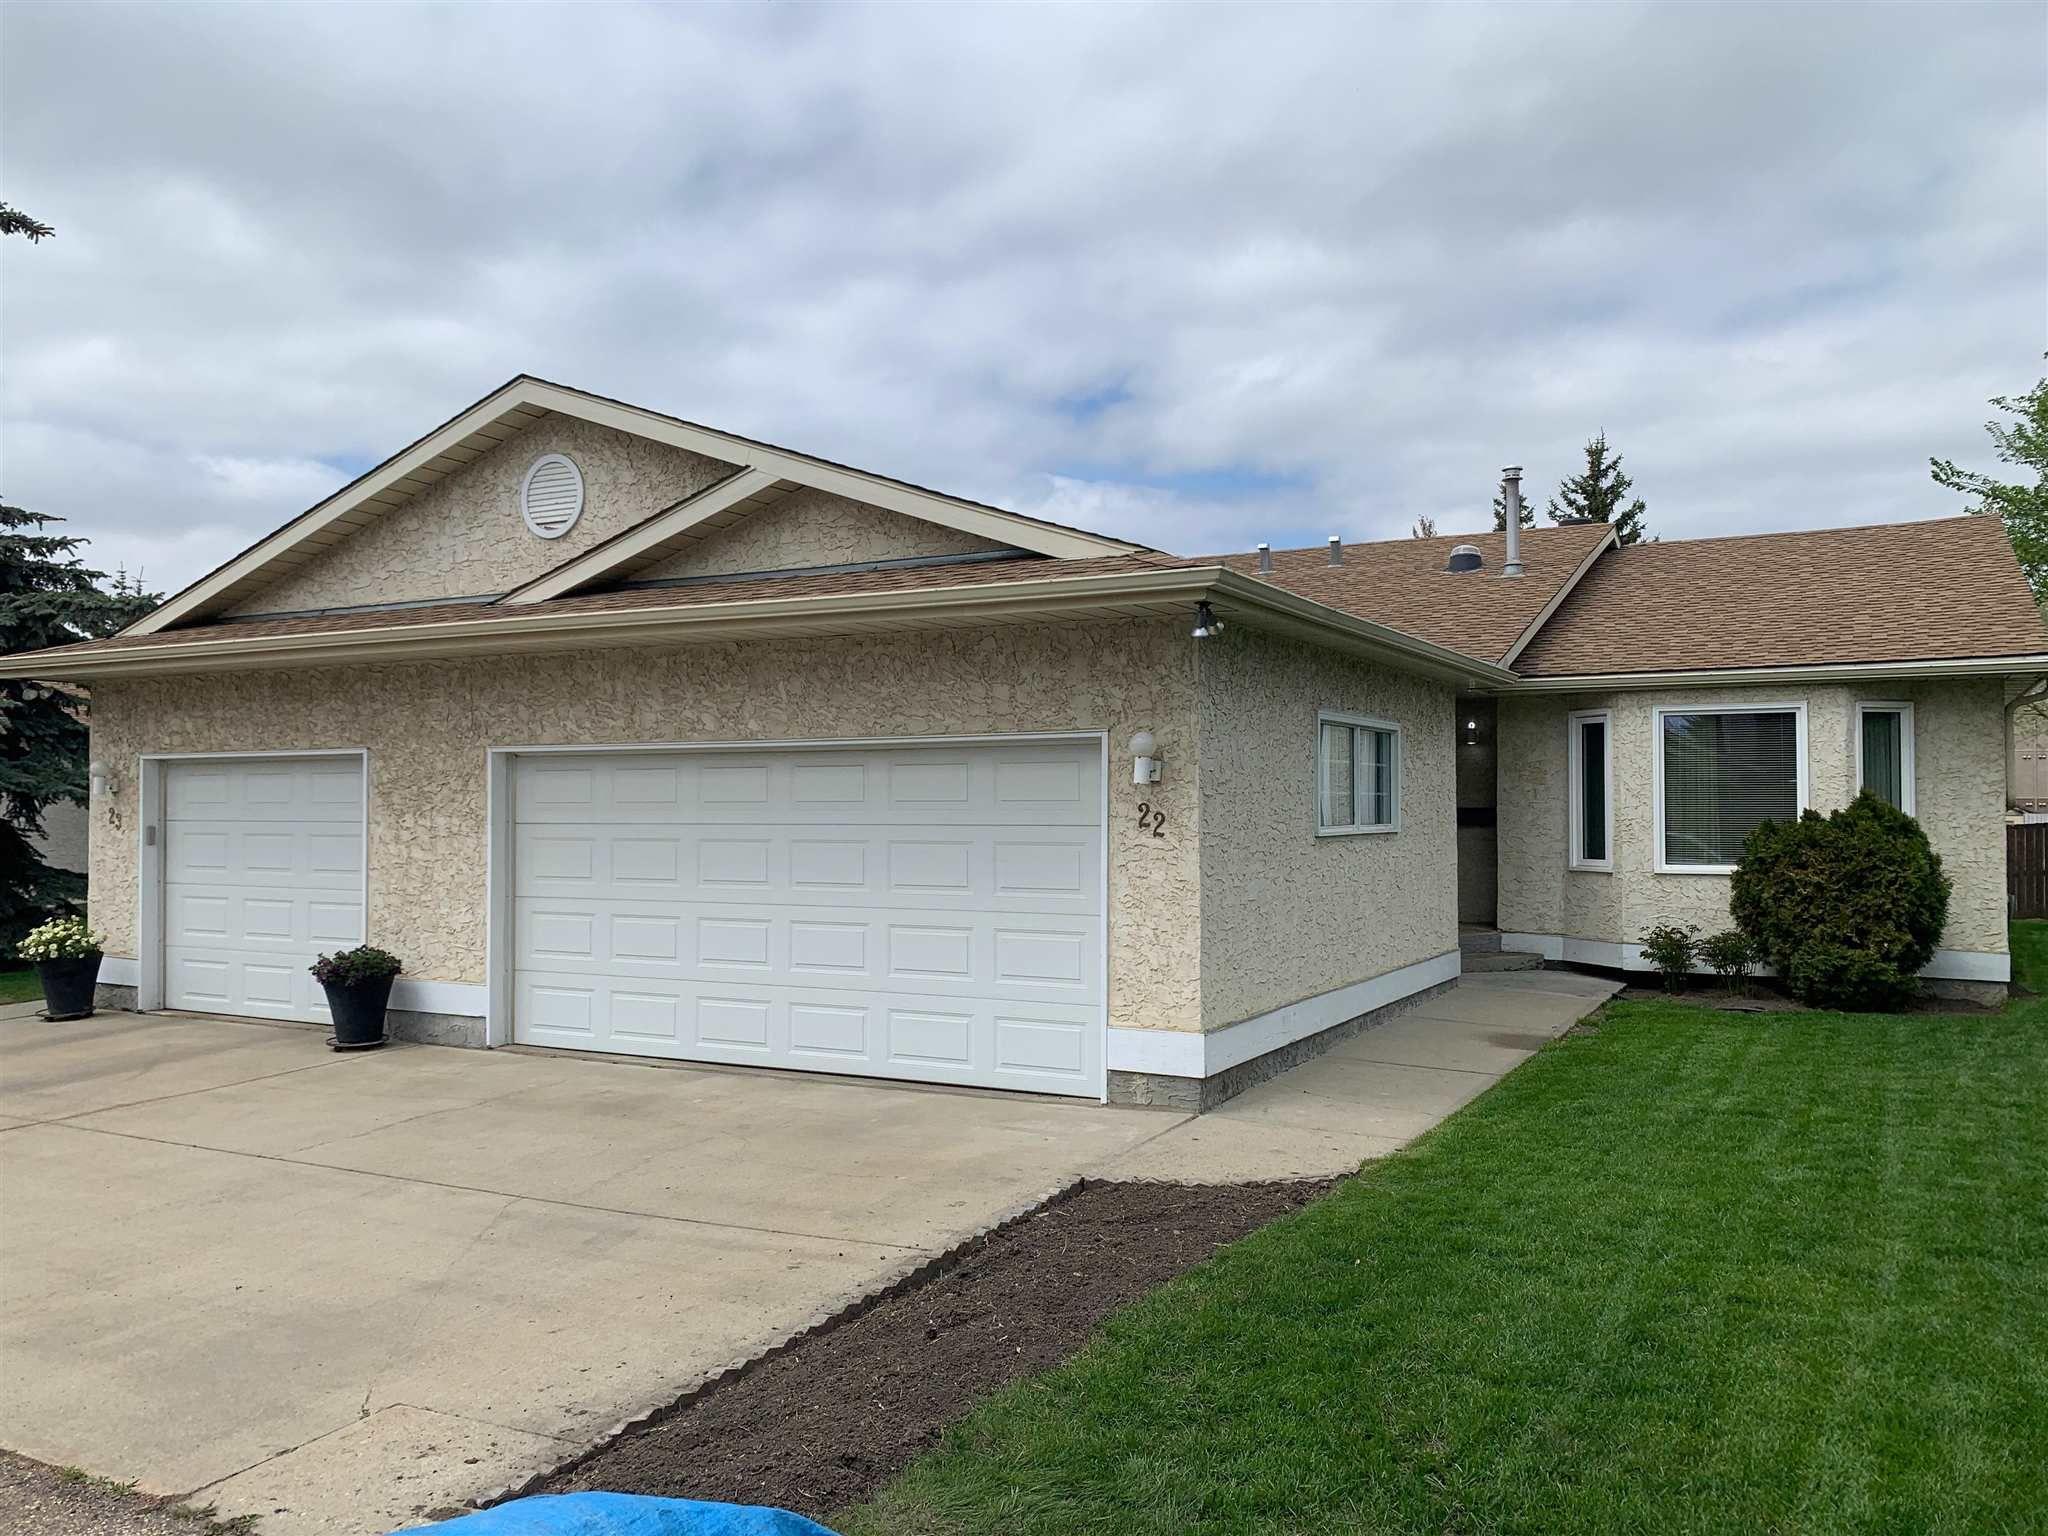 Main Photo: 9375 172 Street in Edmonton: Zone 20 House Half Duplex for sale : MLS®# E4246345